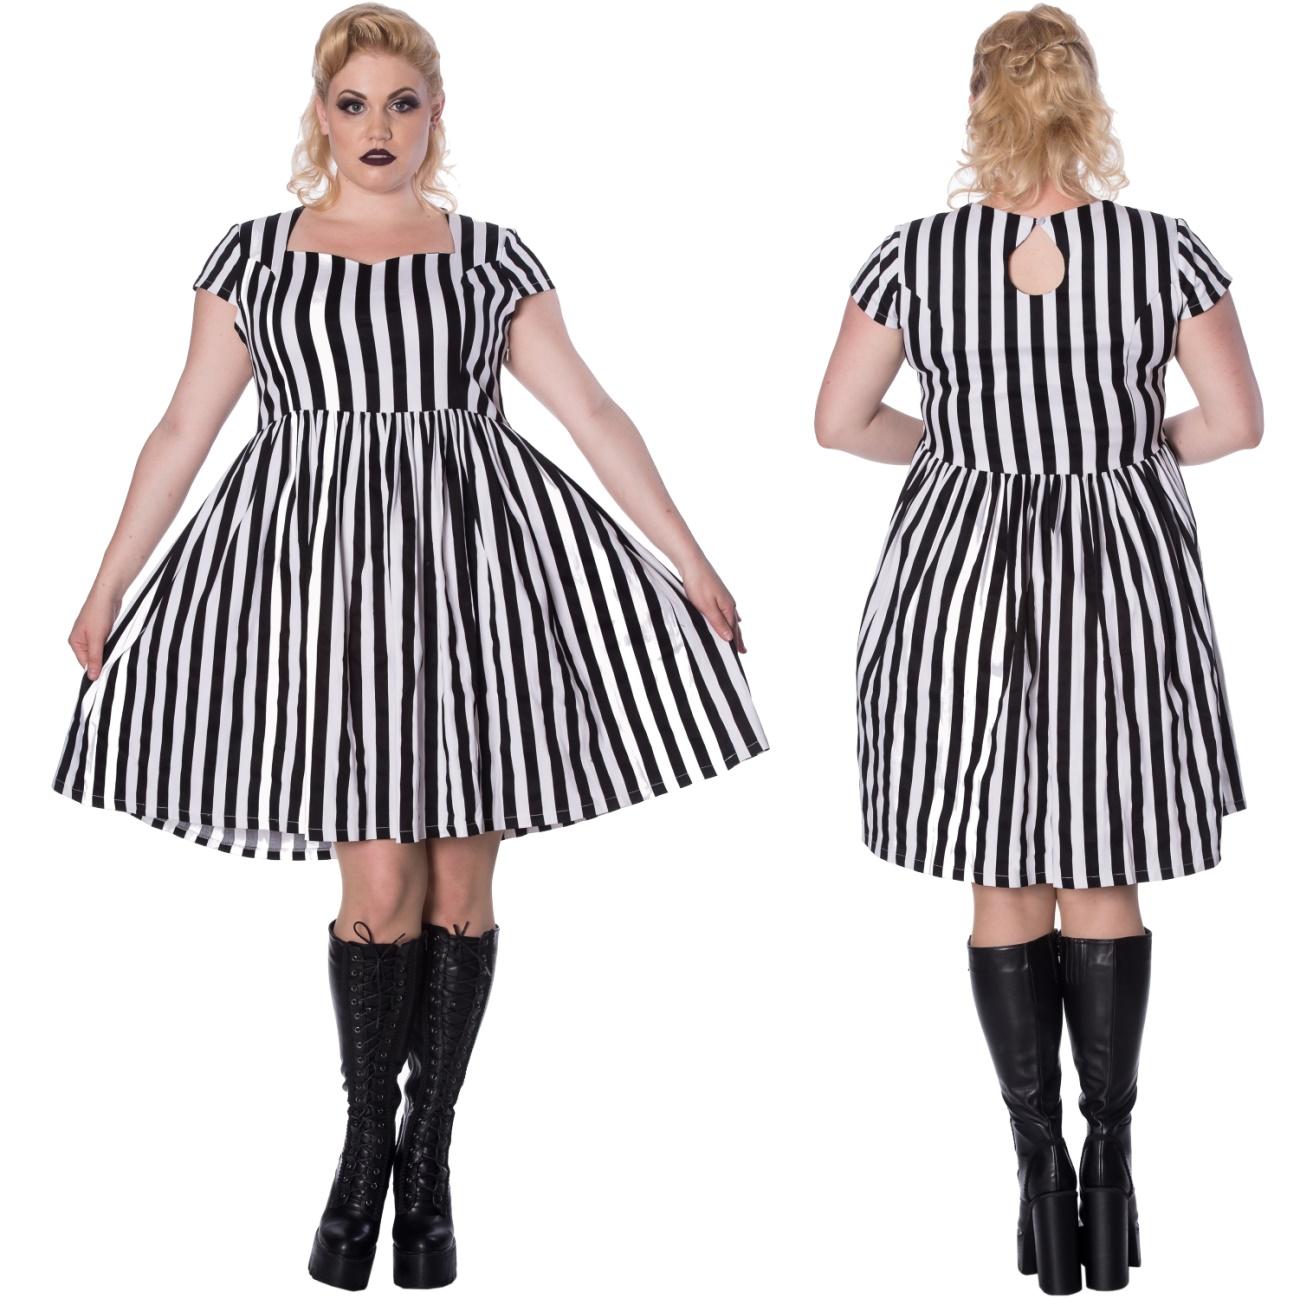 Heart to Heart Dress/Streifen Kleid Plussize Banned - Banned Kleider ...